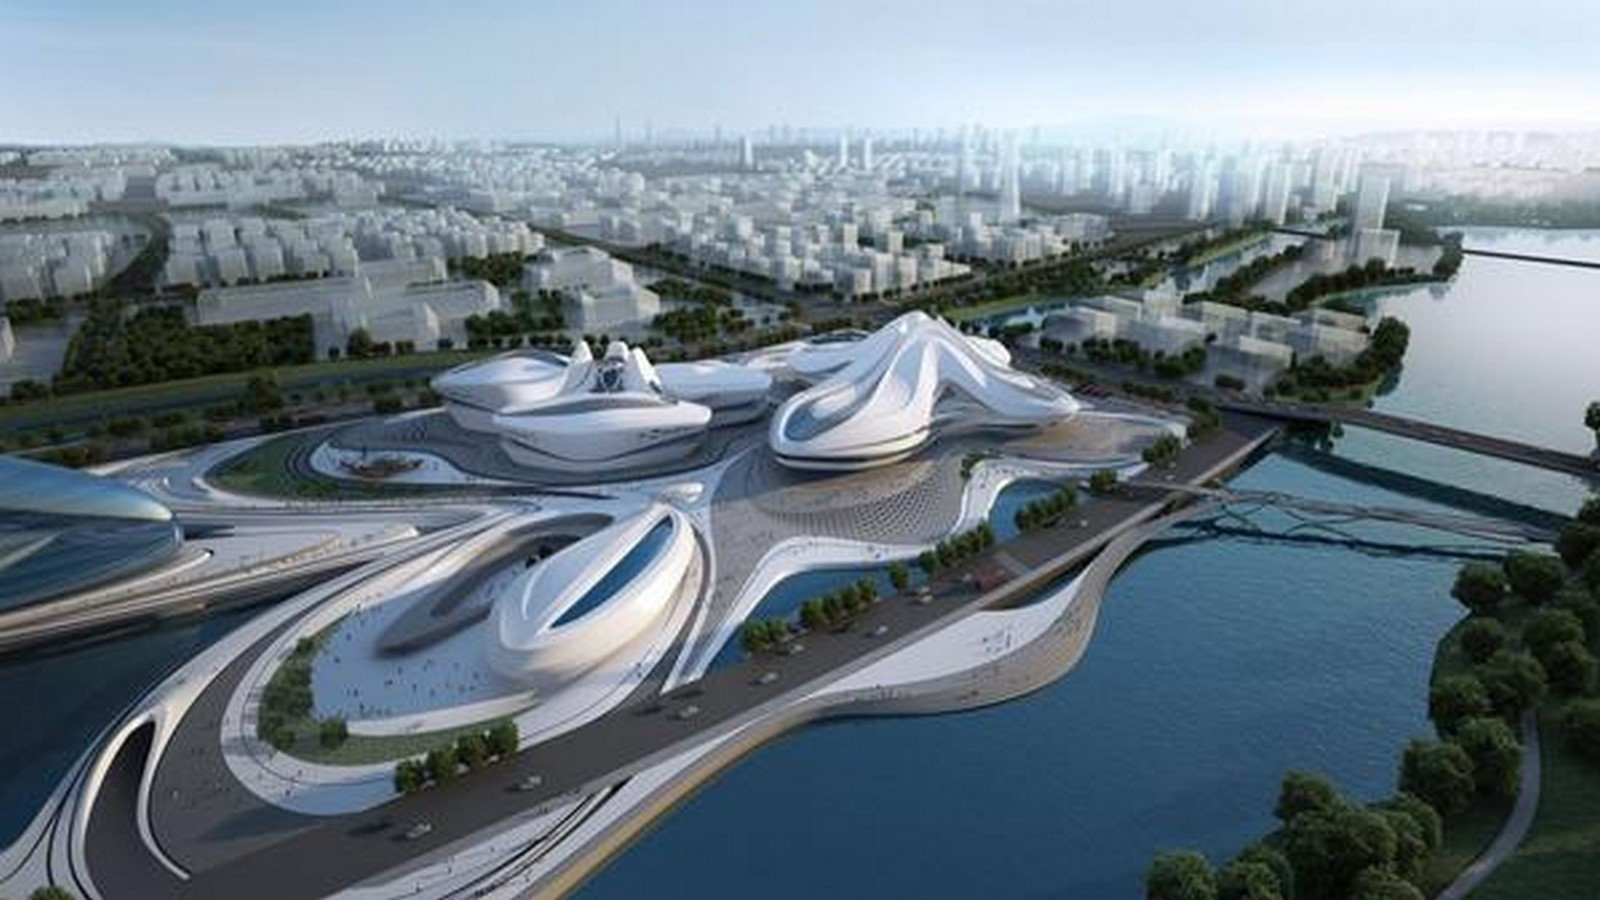 Youtube for Architects: 'Smart Cities / Smart Buildings' seminar- Zaha Hadid Architects Sheet8